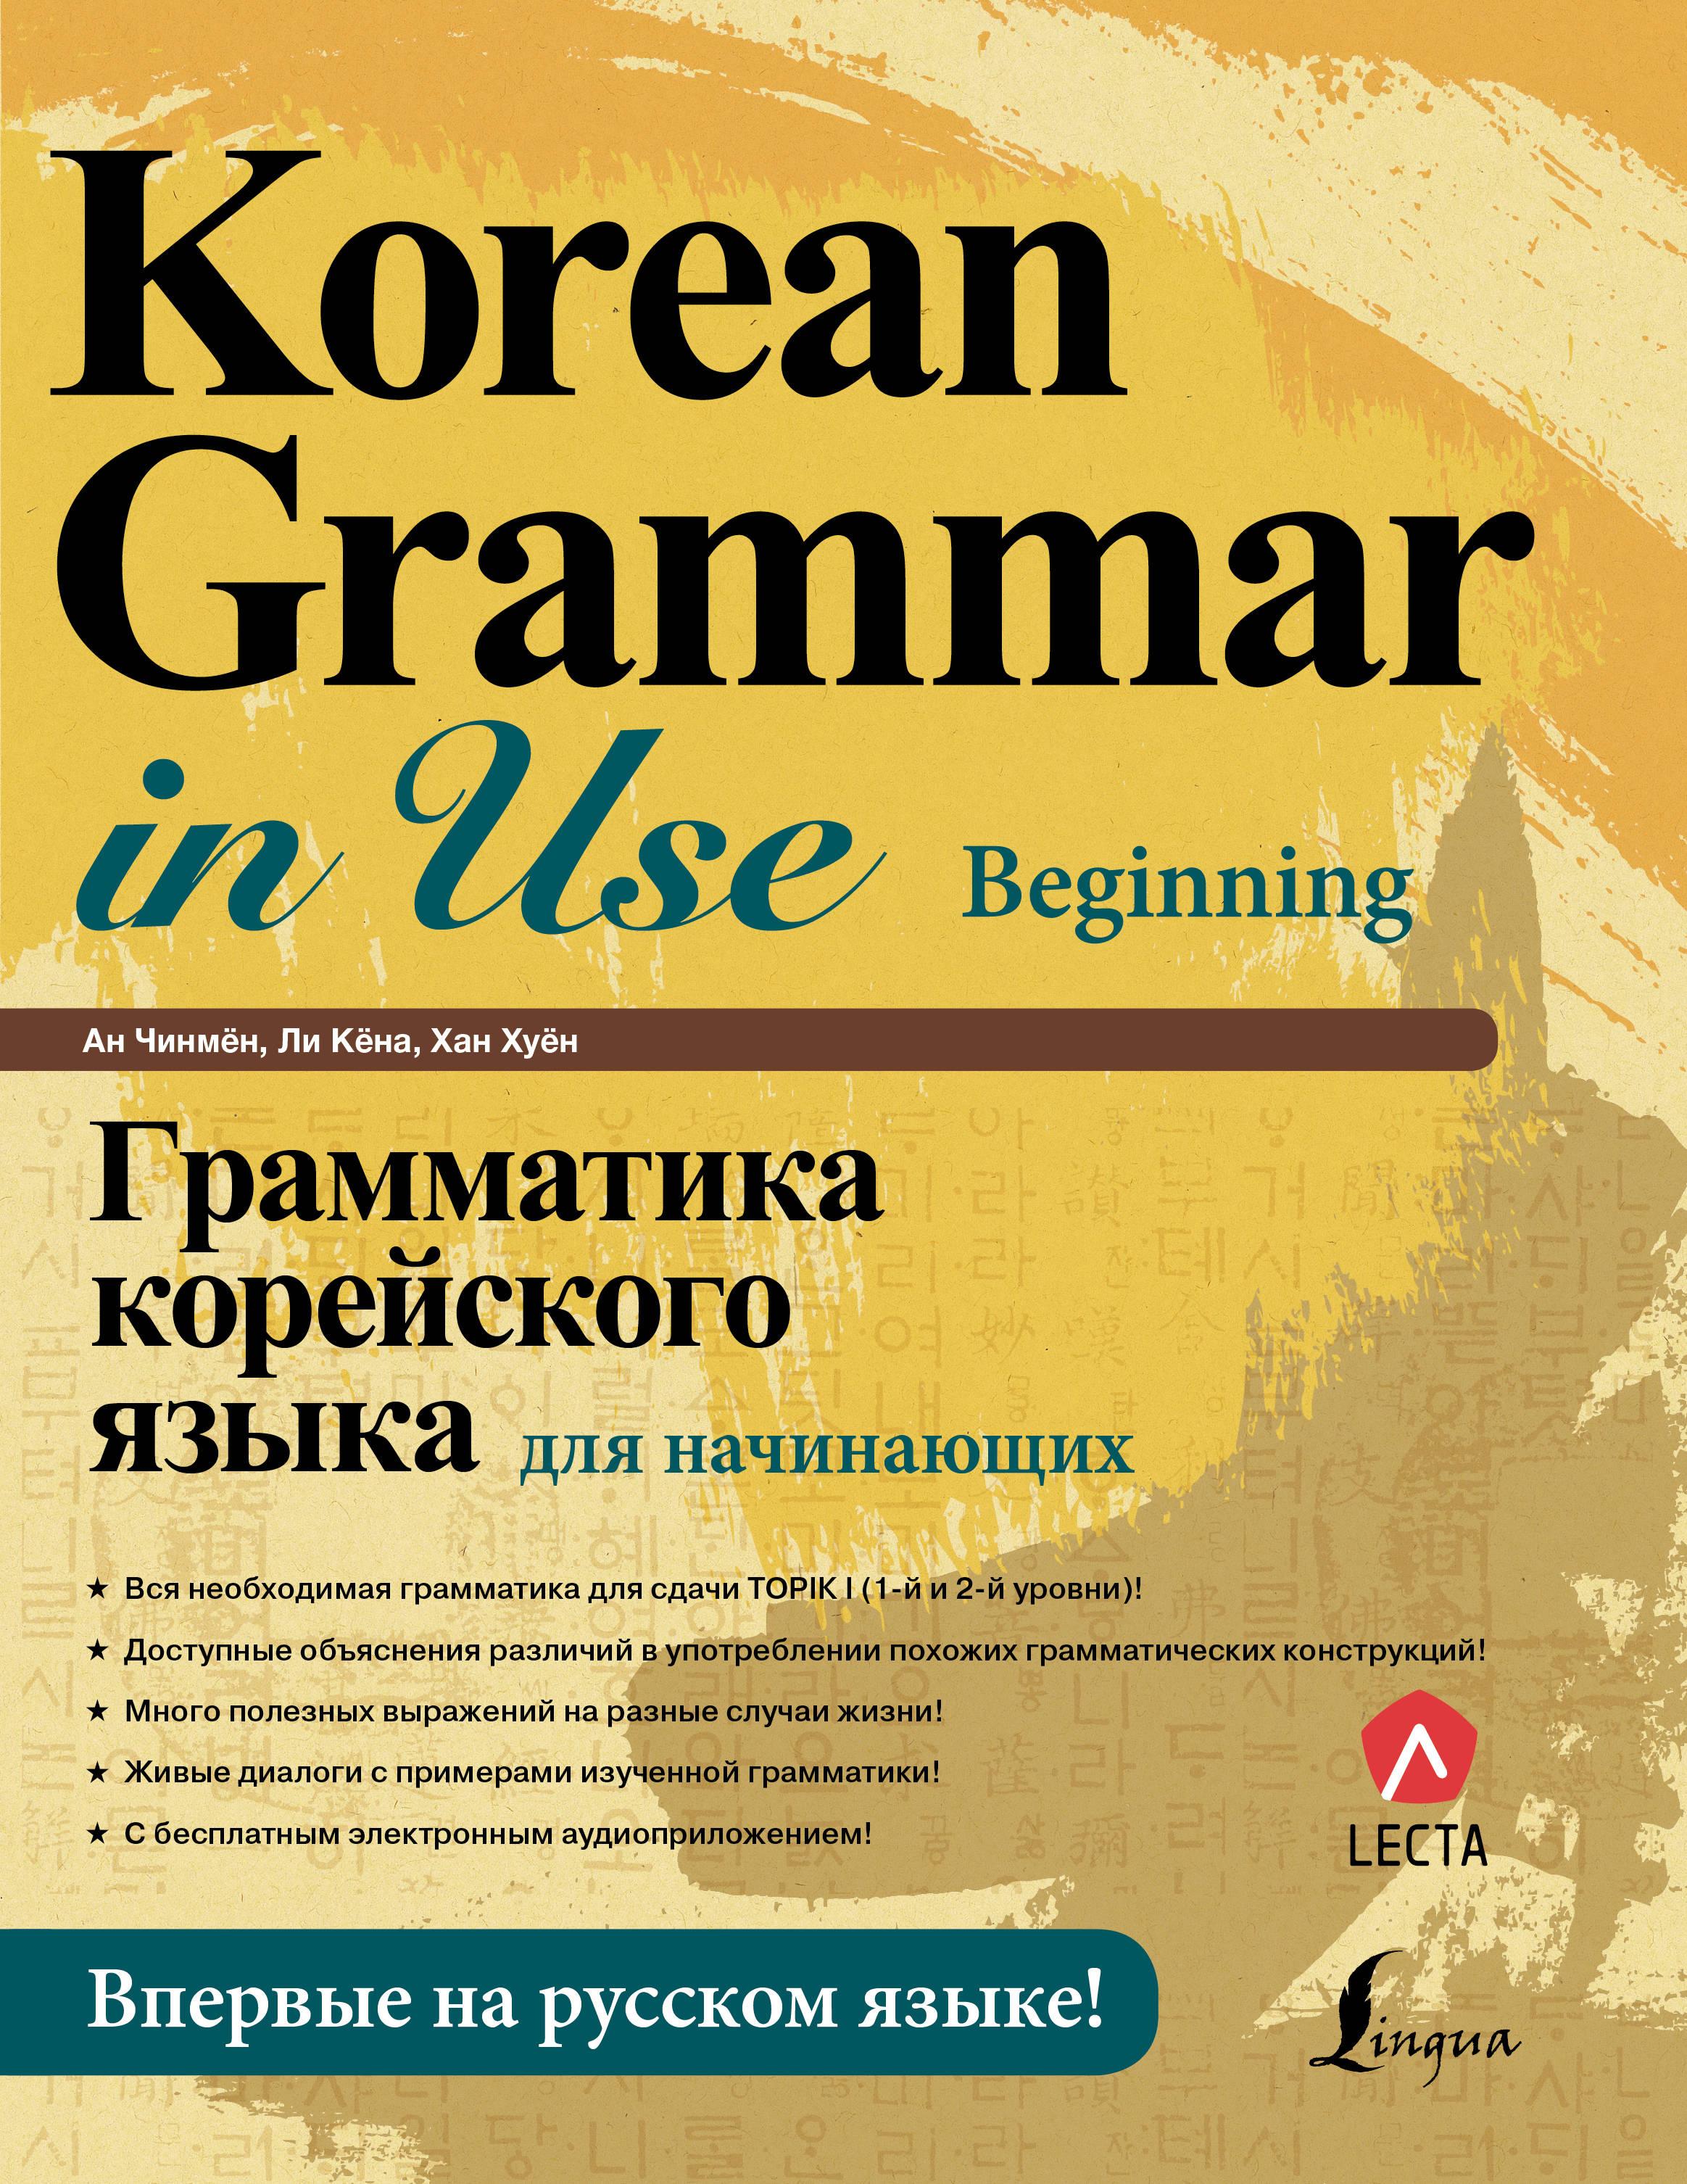 Ан Чинмён; Ли Кёна; Хан Хуён Грамматика корейского языка для начинающих + LECTA